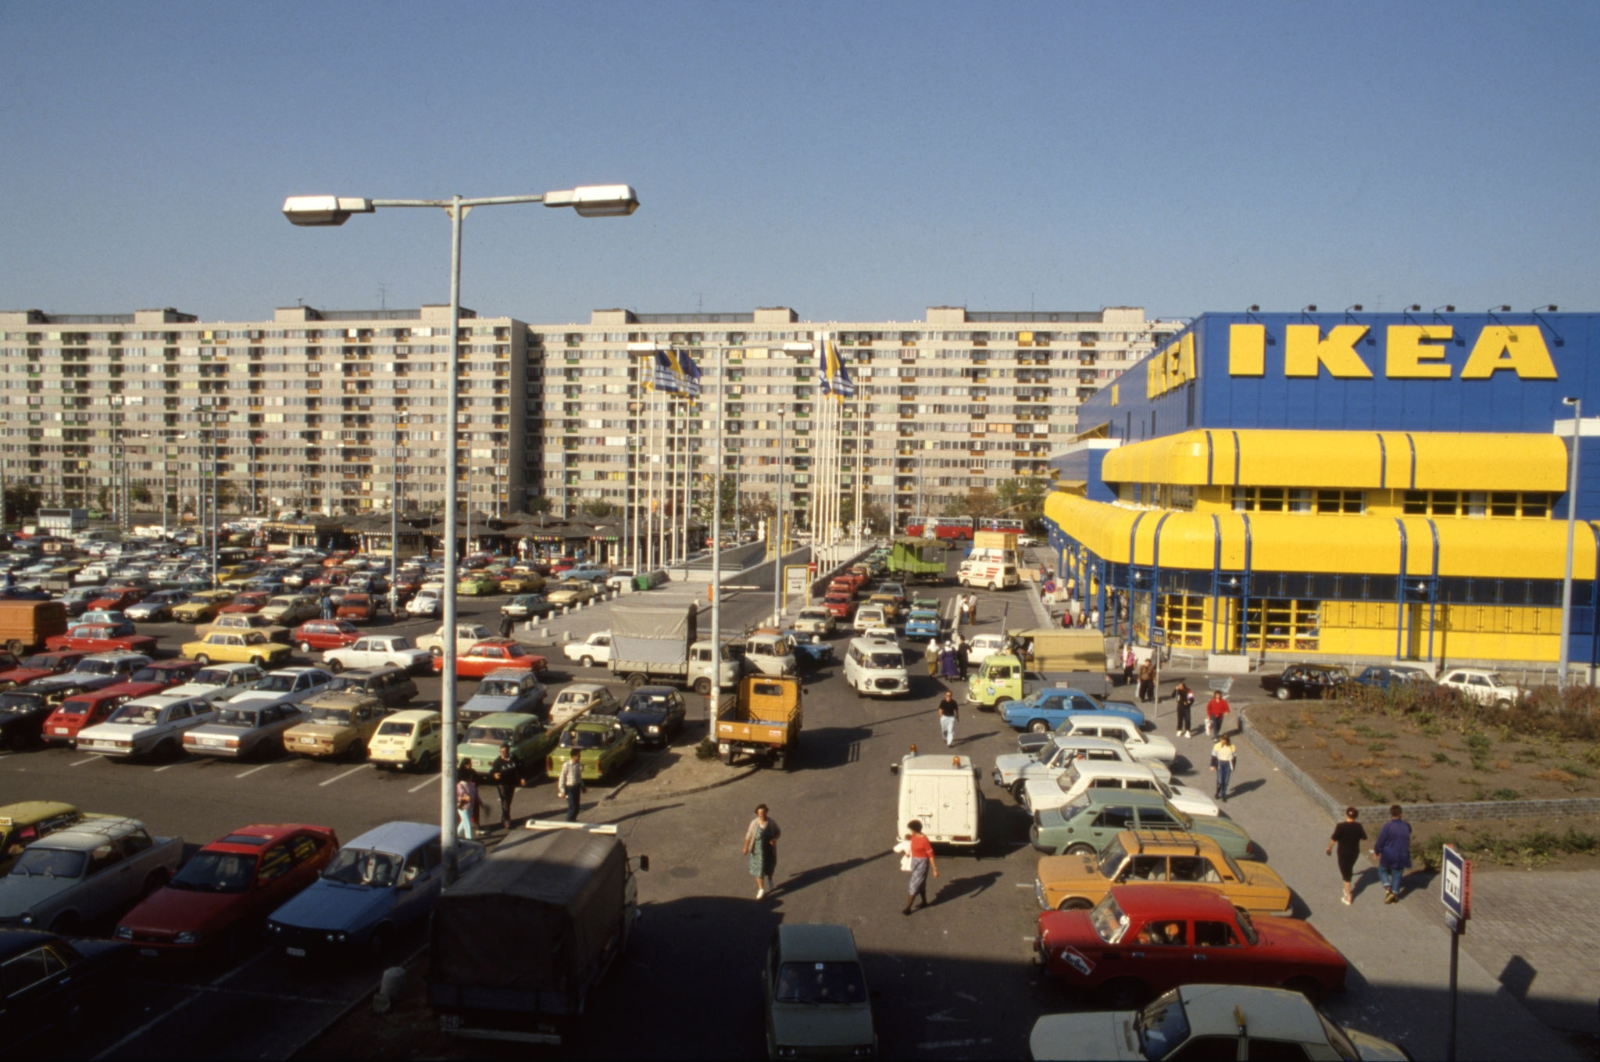 1990 Budapest. Парковка в магазине Ikea в Будапеште